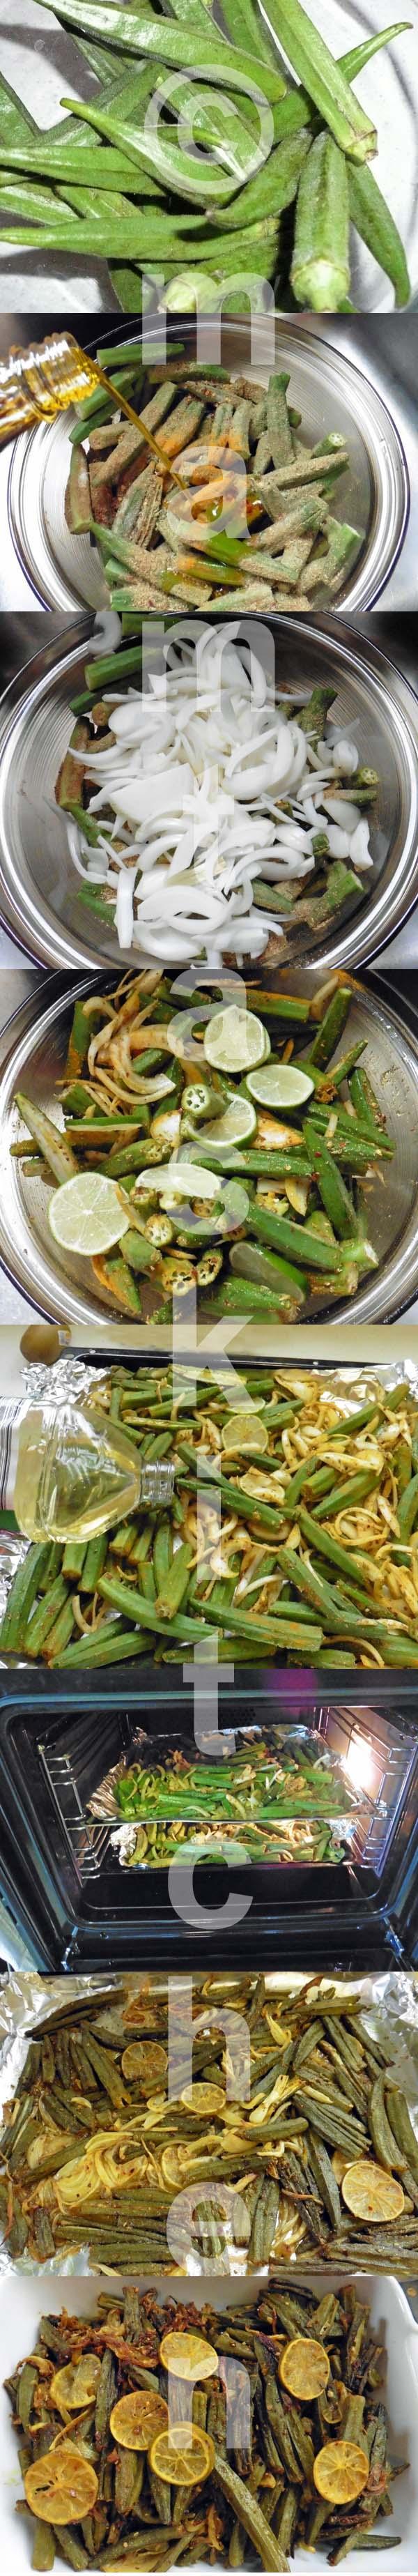 Bhindi (Whole Okra/Ladies Fingers) Bhaji/Sabji, Oven Cooked